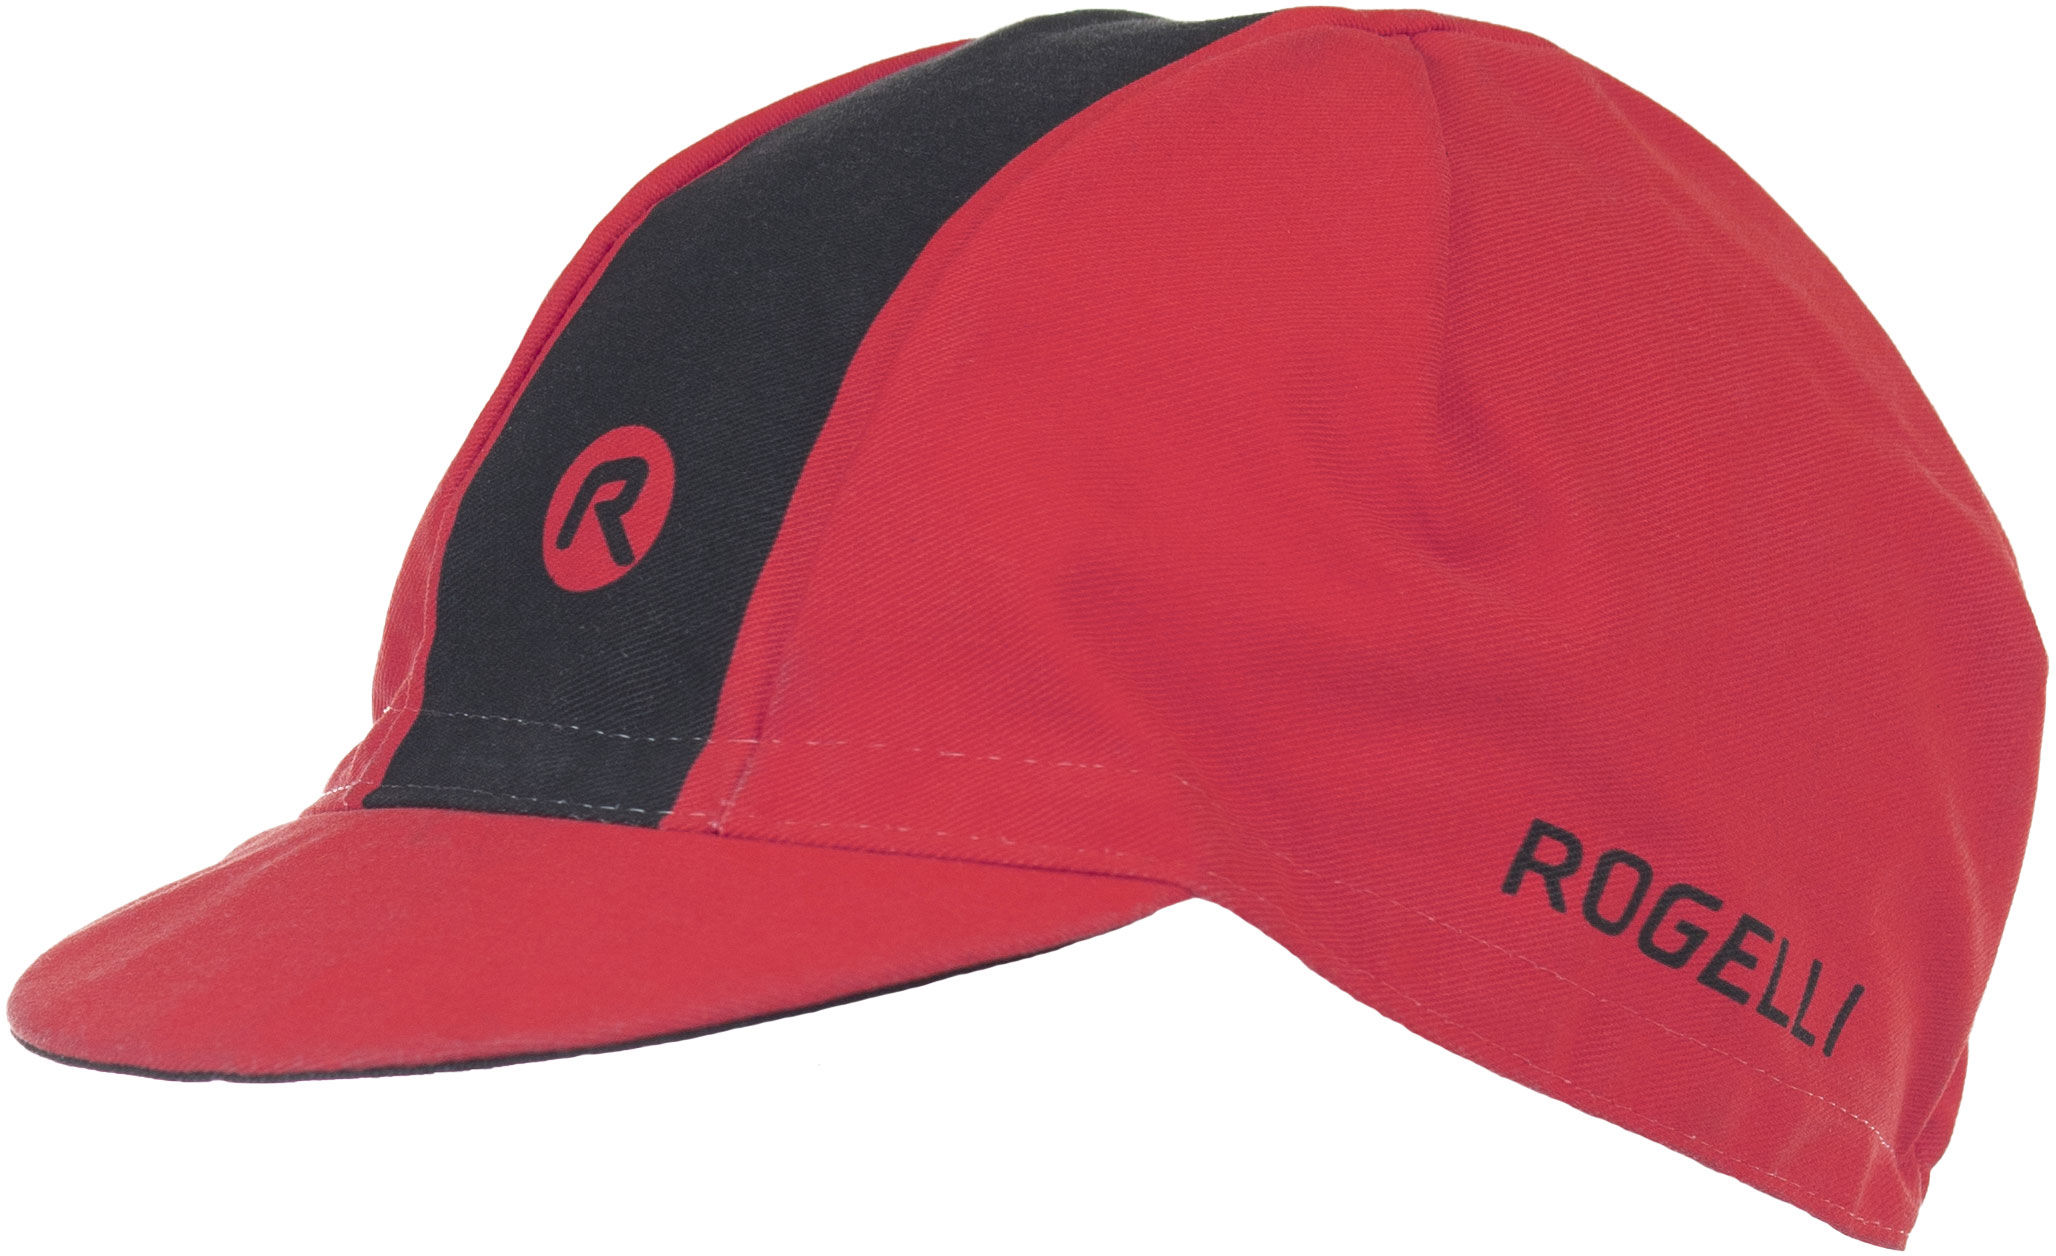 Rogelli Retro czapeczka kolarska 009.969,8717849103466